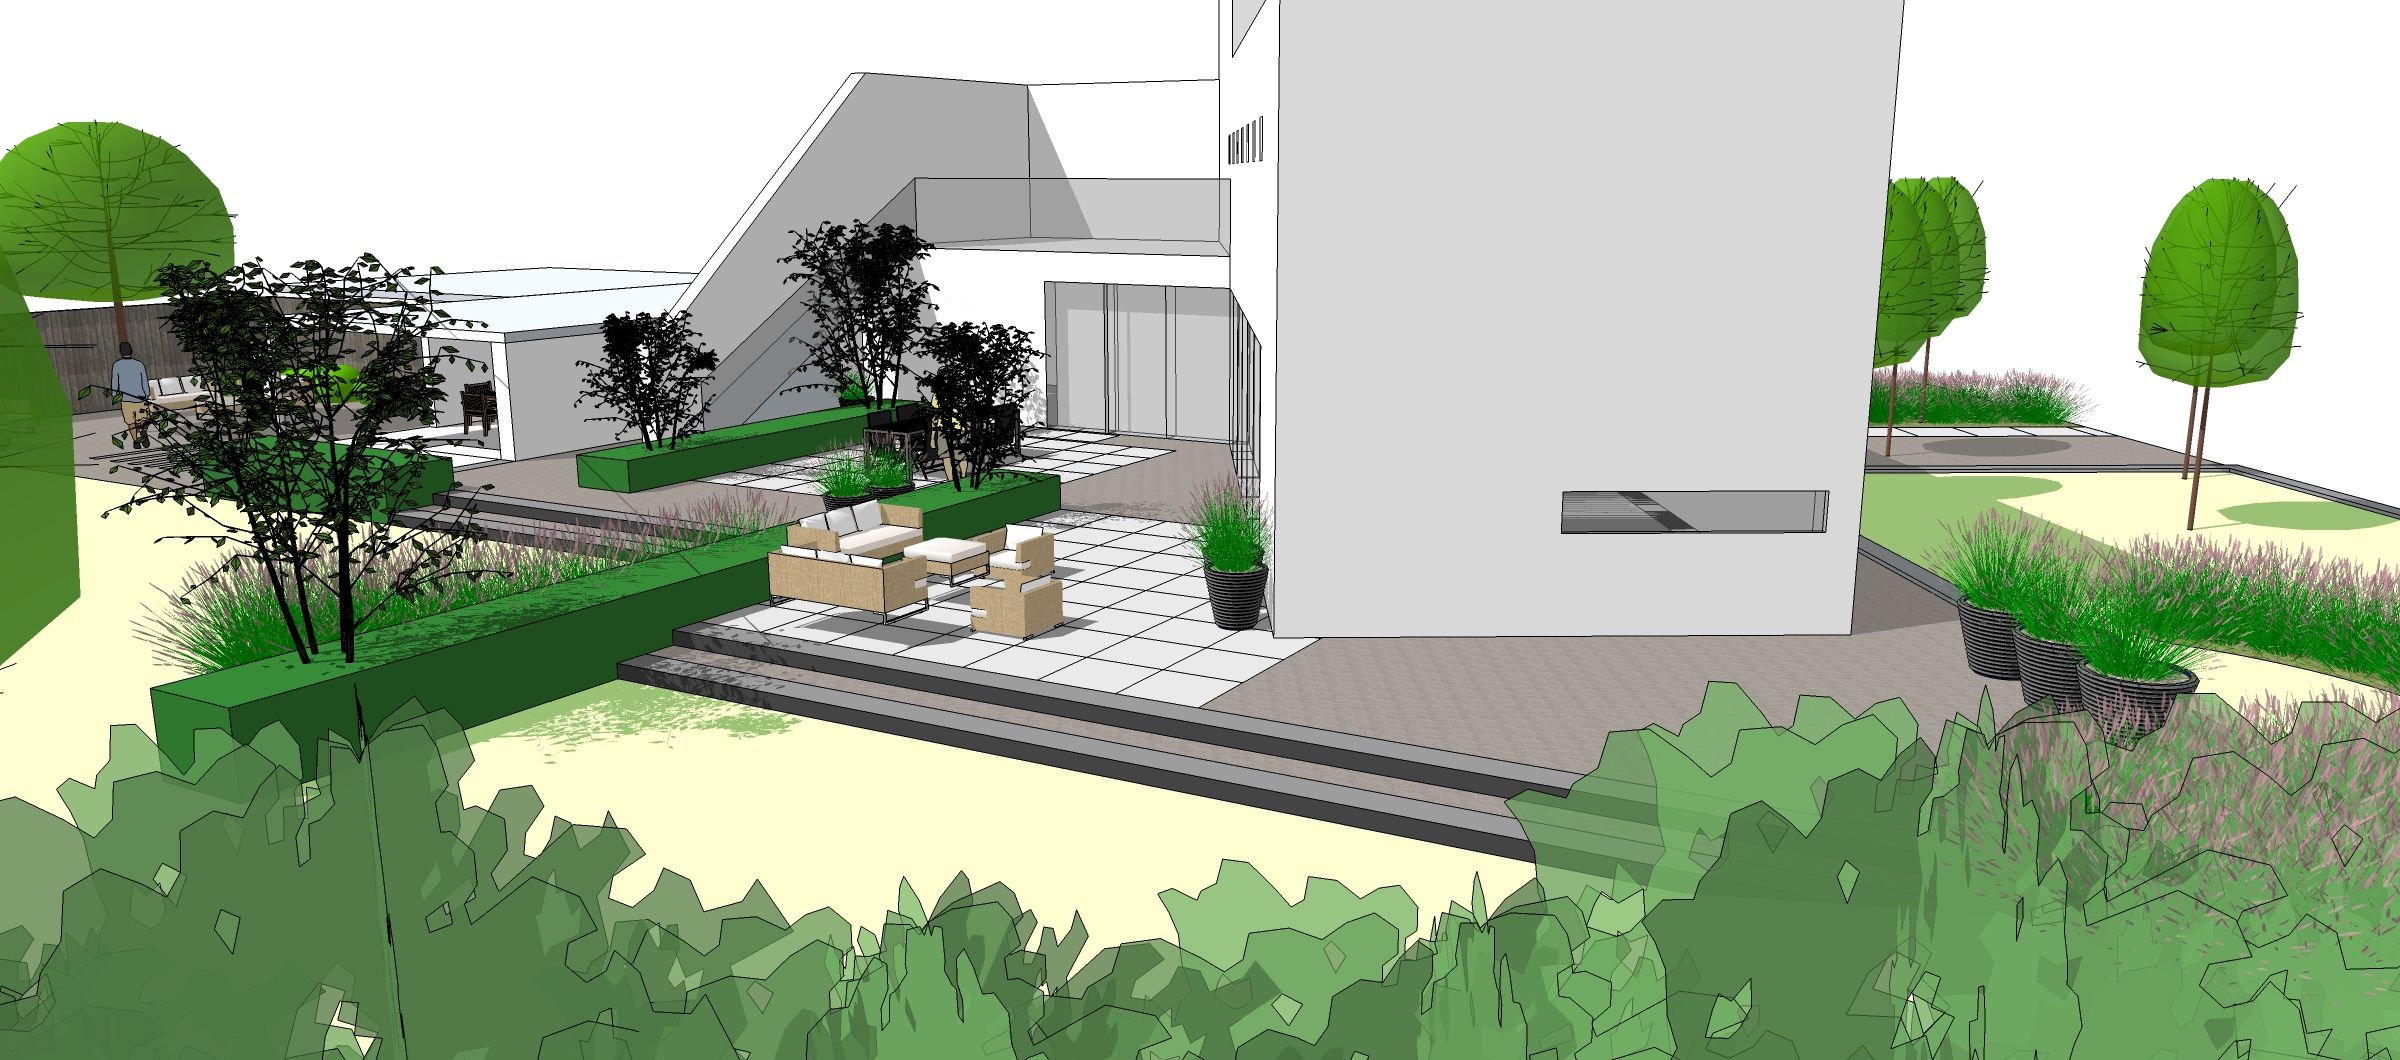 perspectieve exclusieve moderne tuin tuin ontwerp tuin